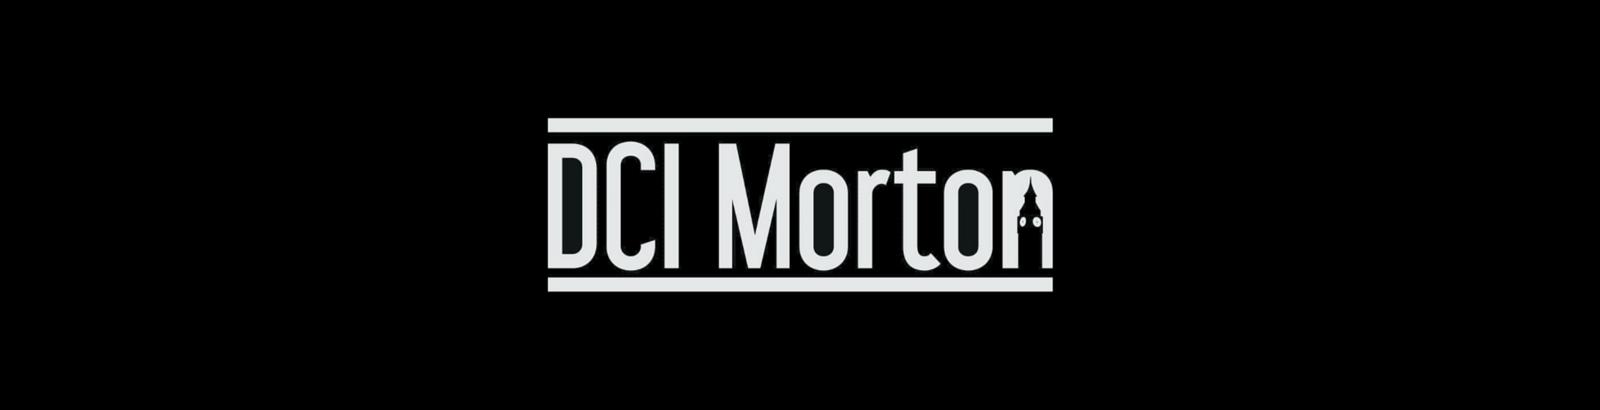 DCIMorton.com